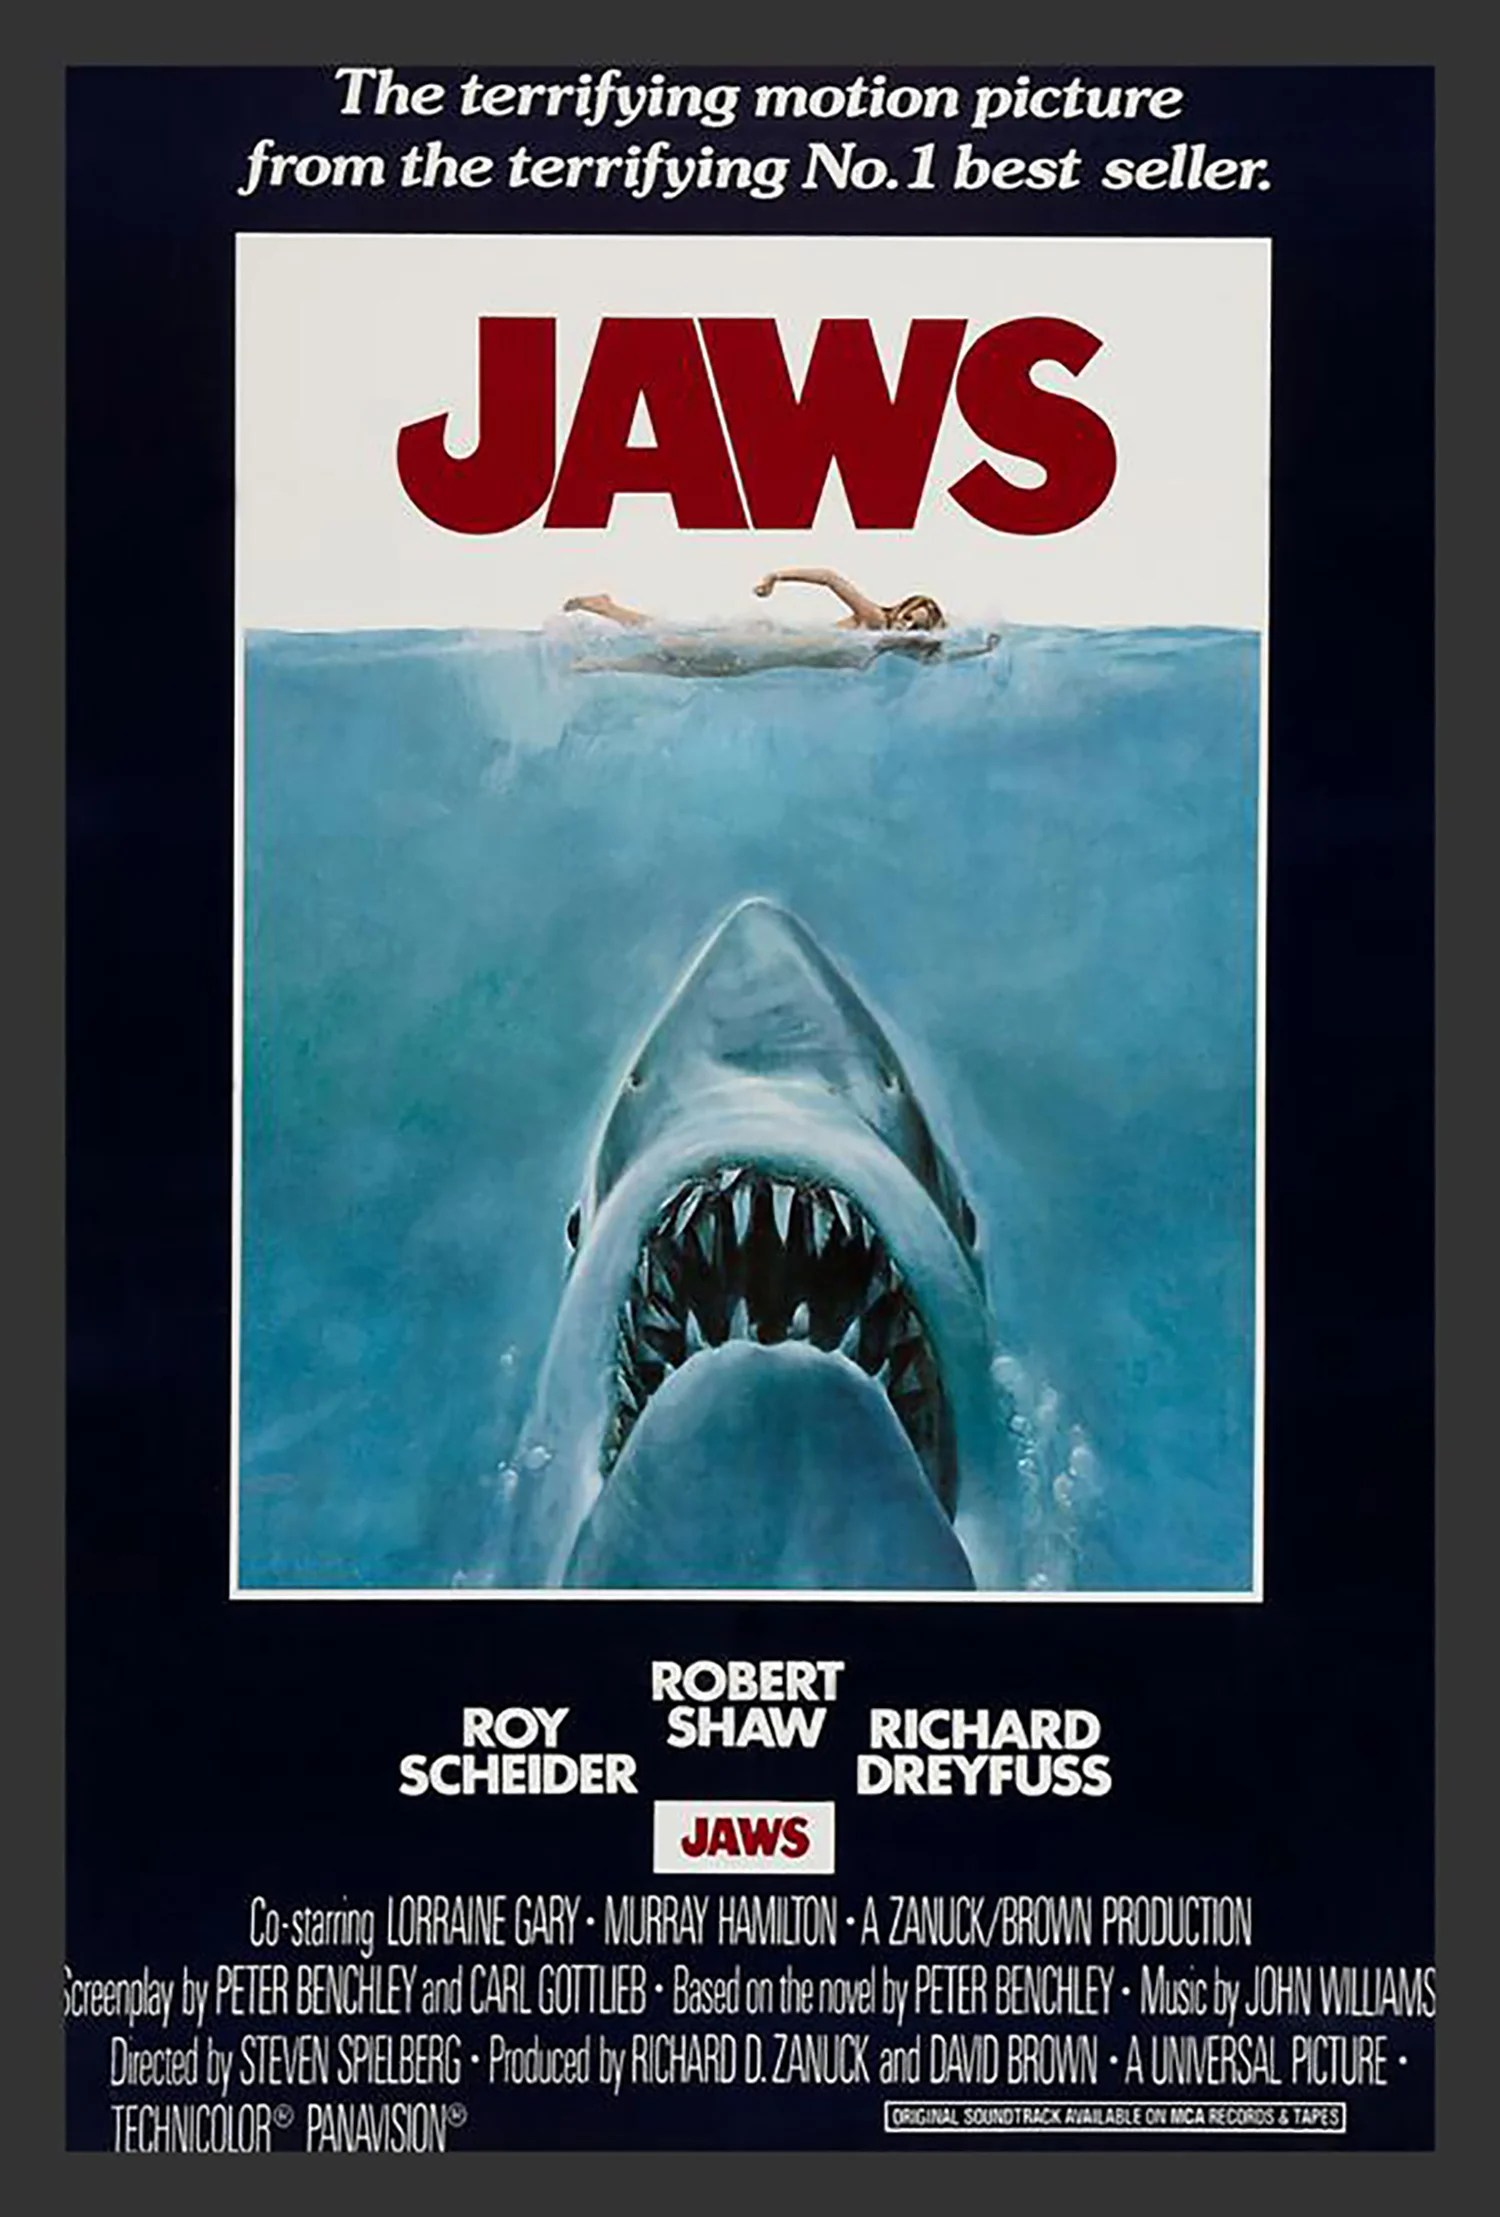 jaws movie poster framed vintage advertisement